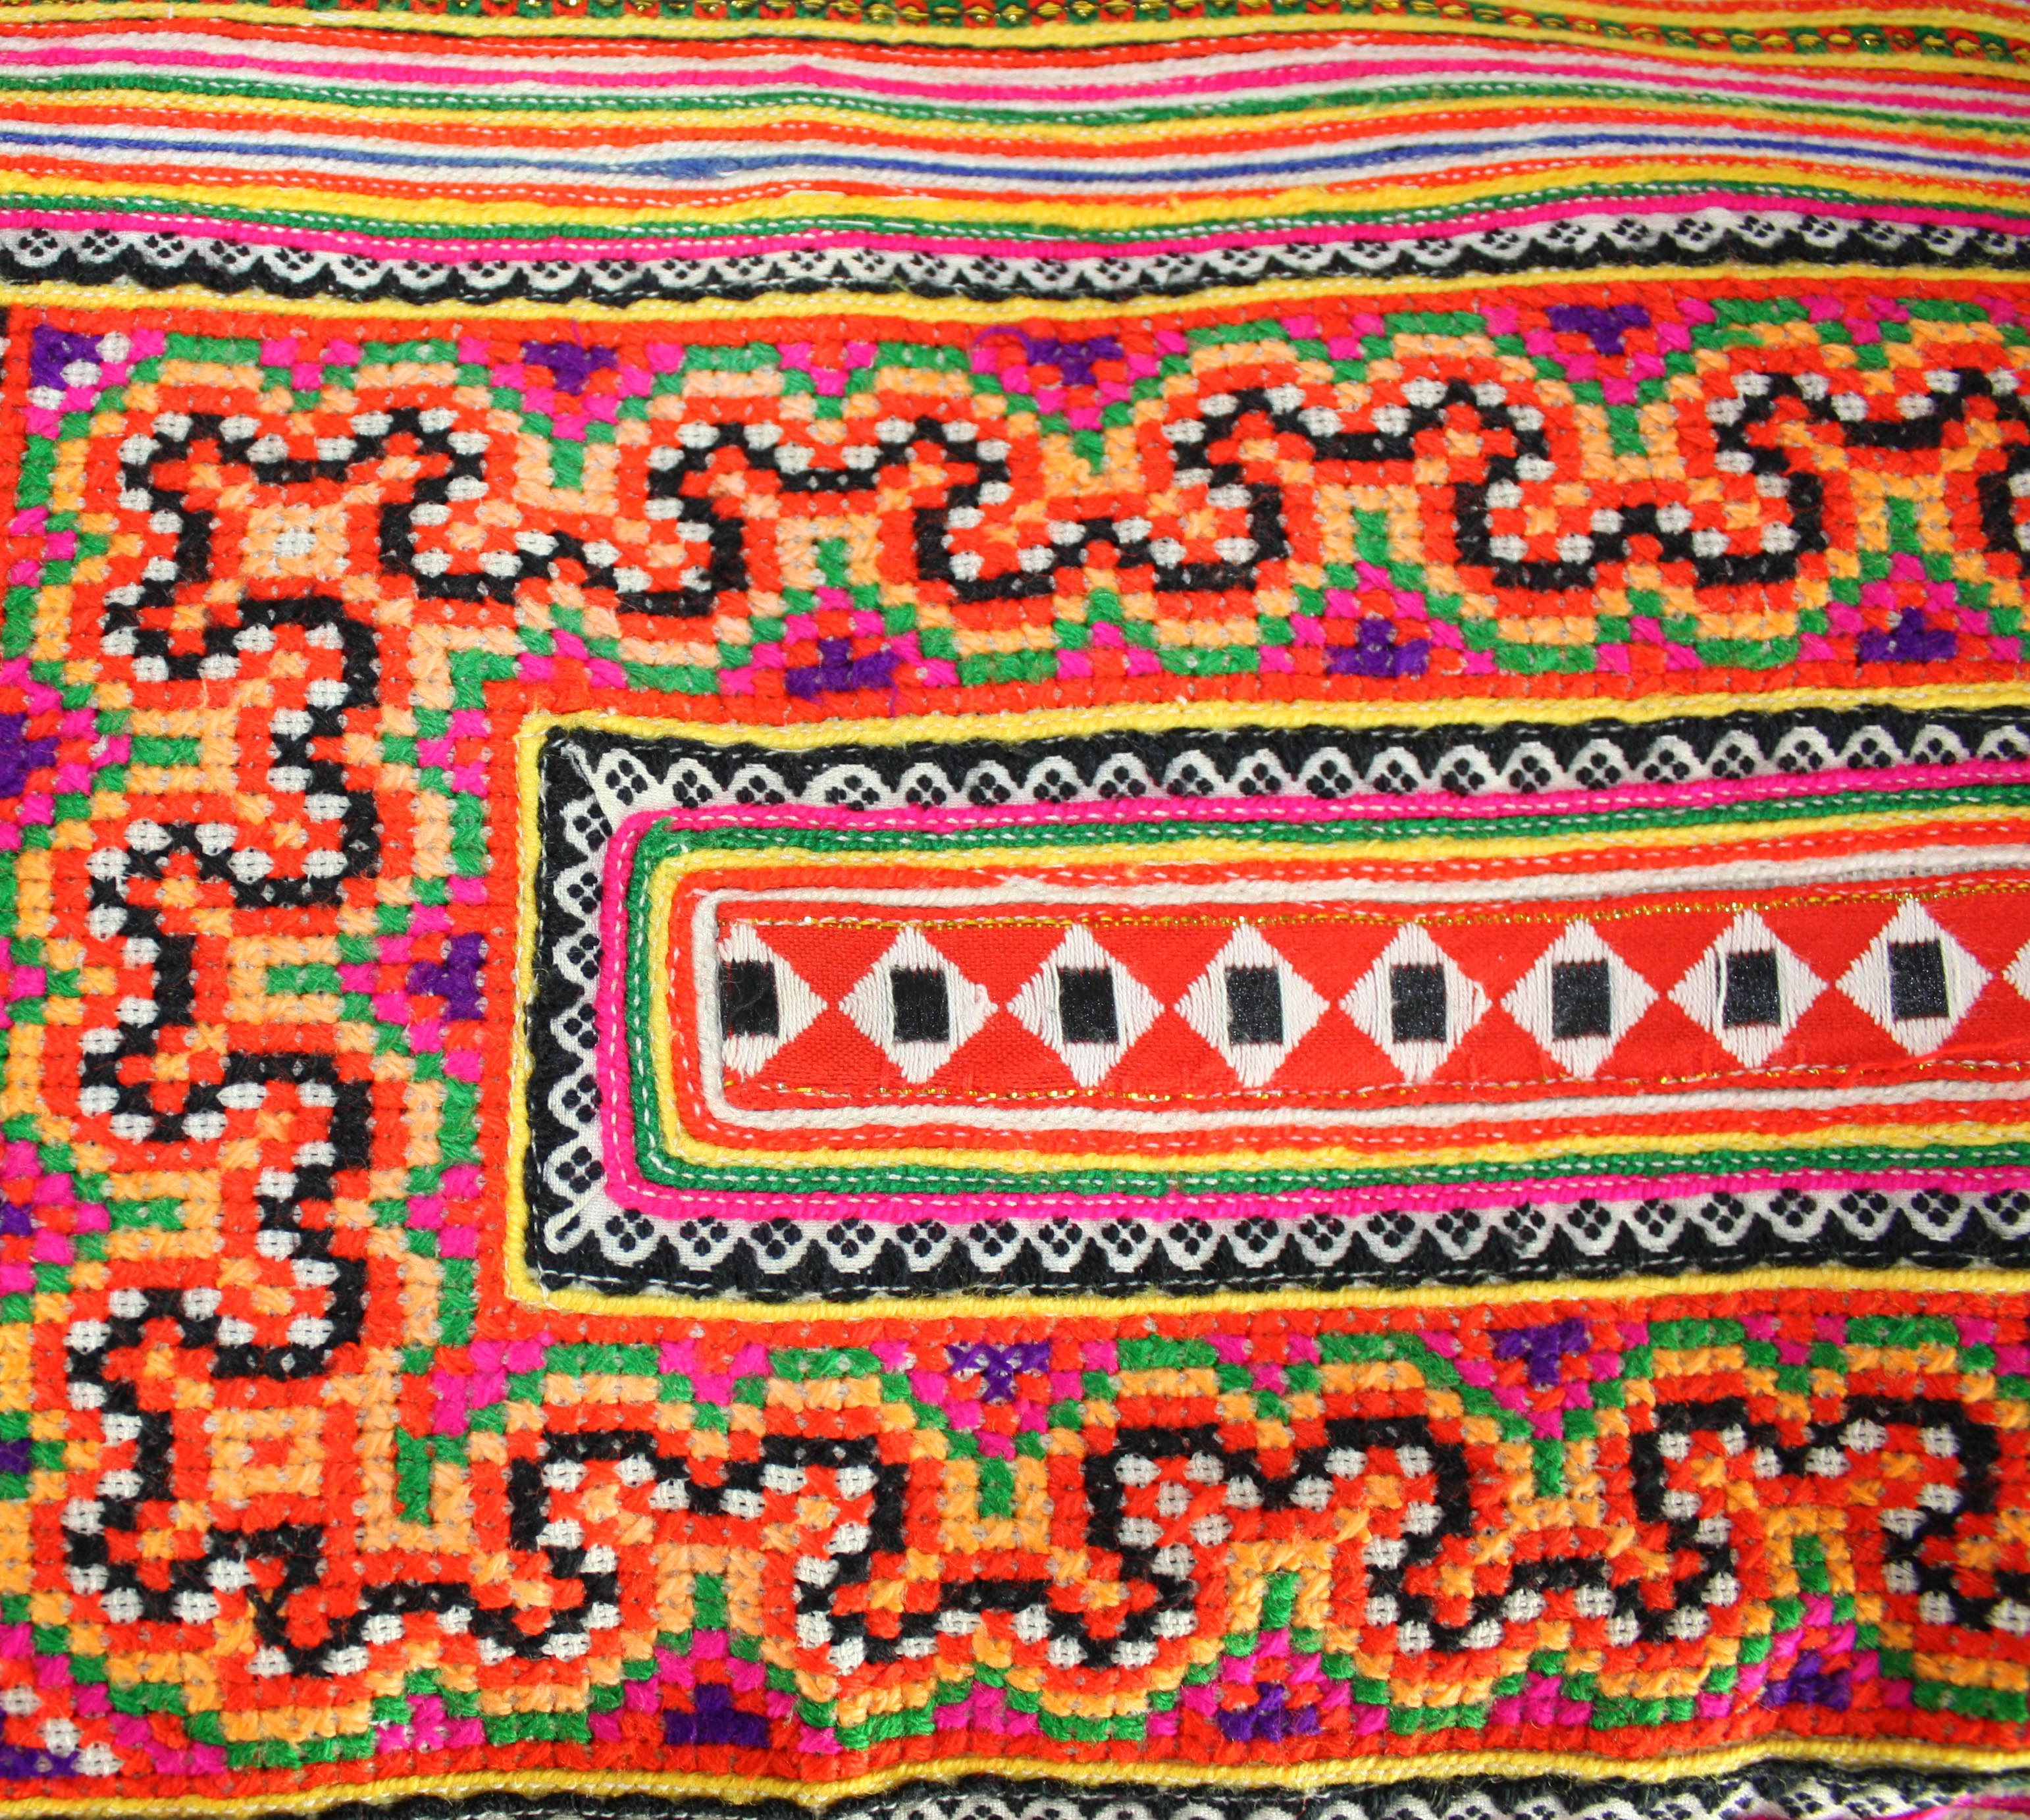 Hmong Hill Tribe